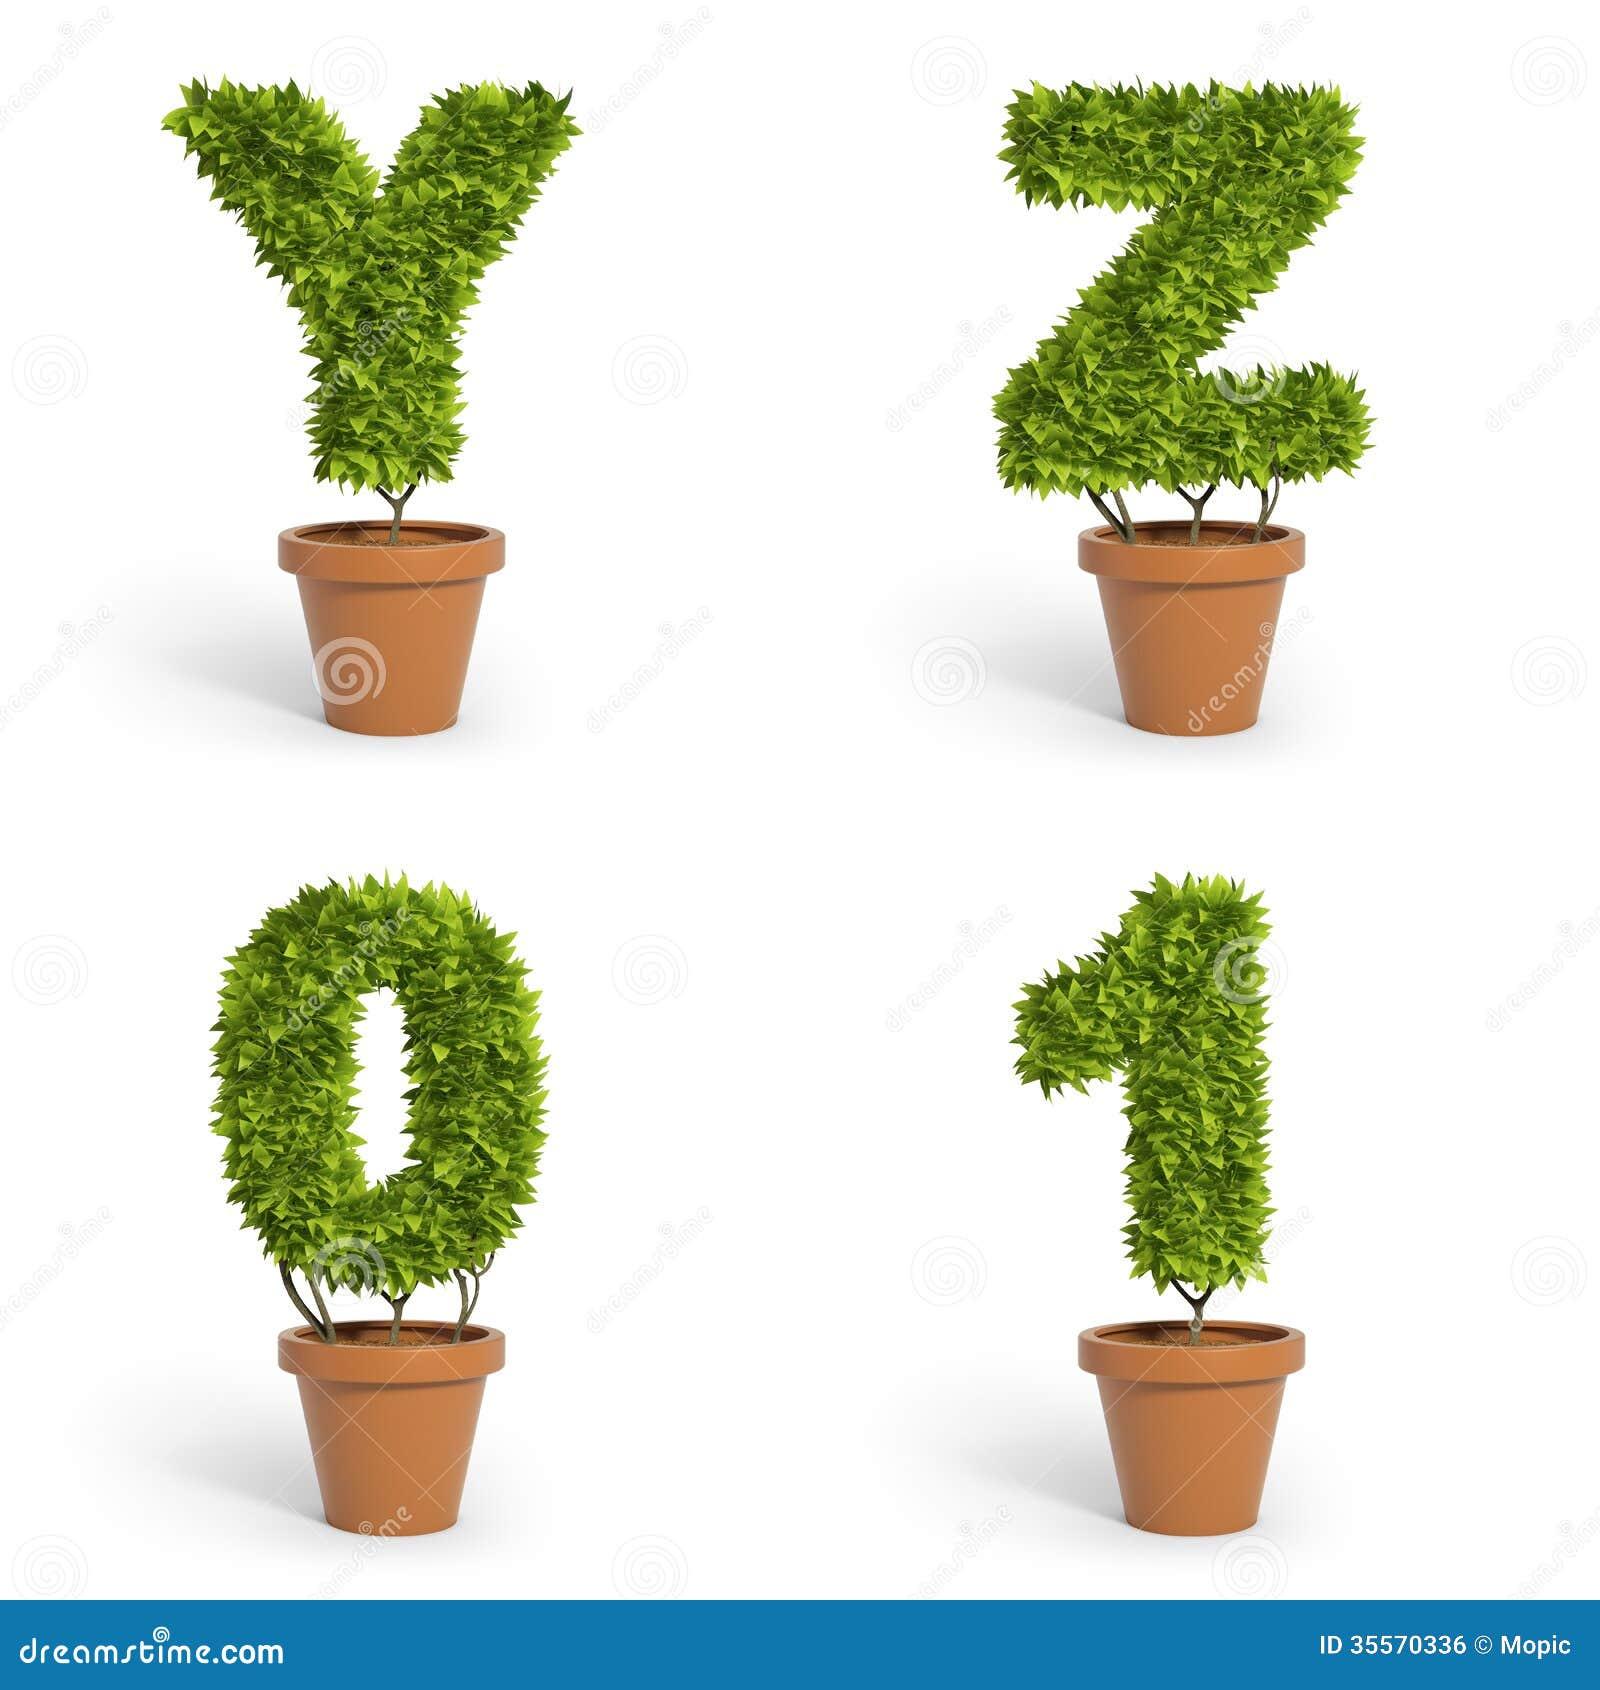 3d Font Pot Plants Royalty Free Stock Image Image 35570336